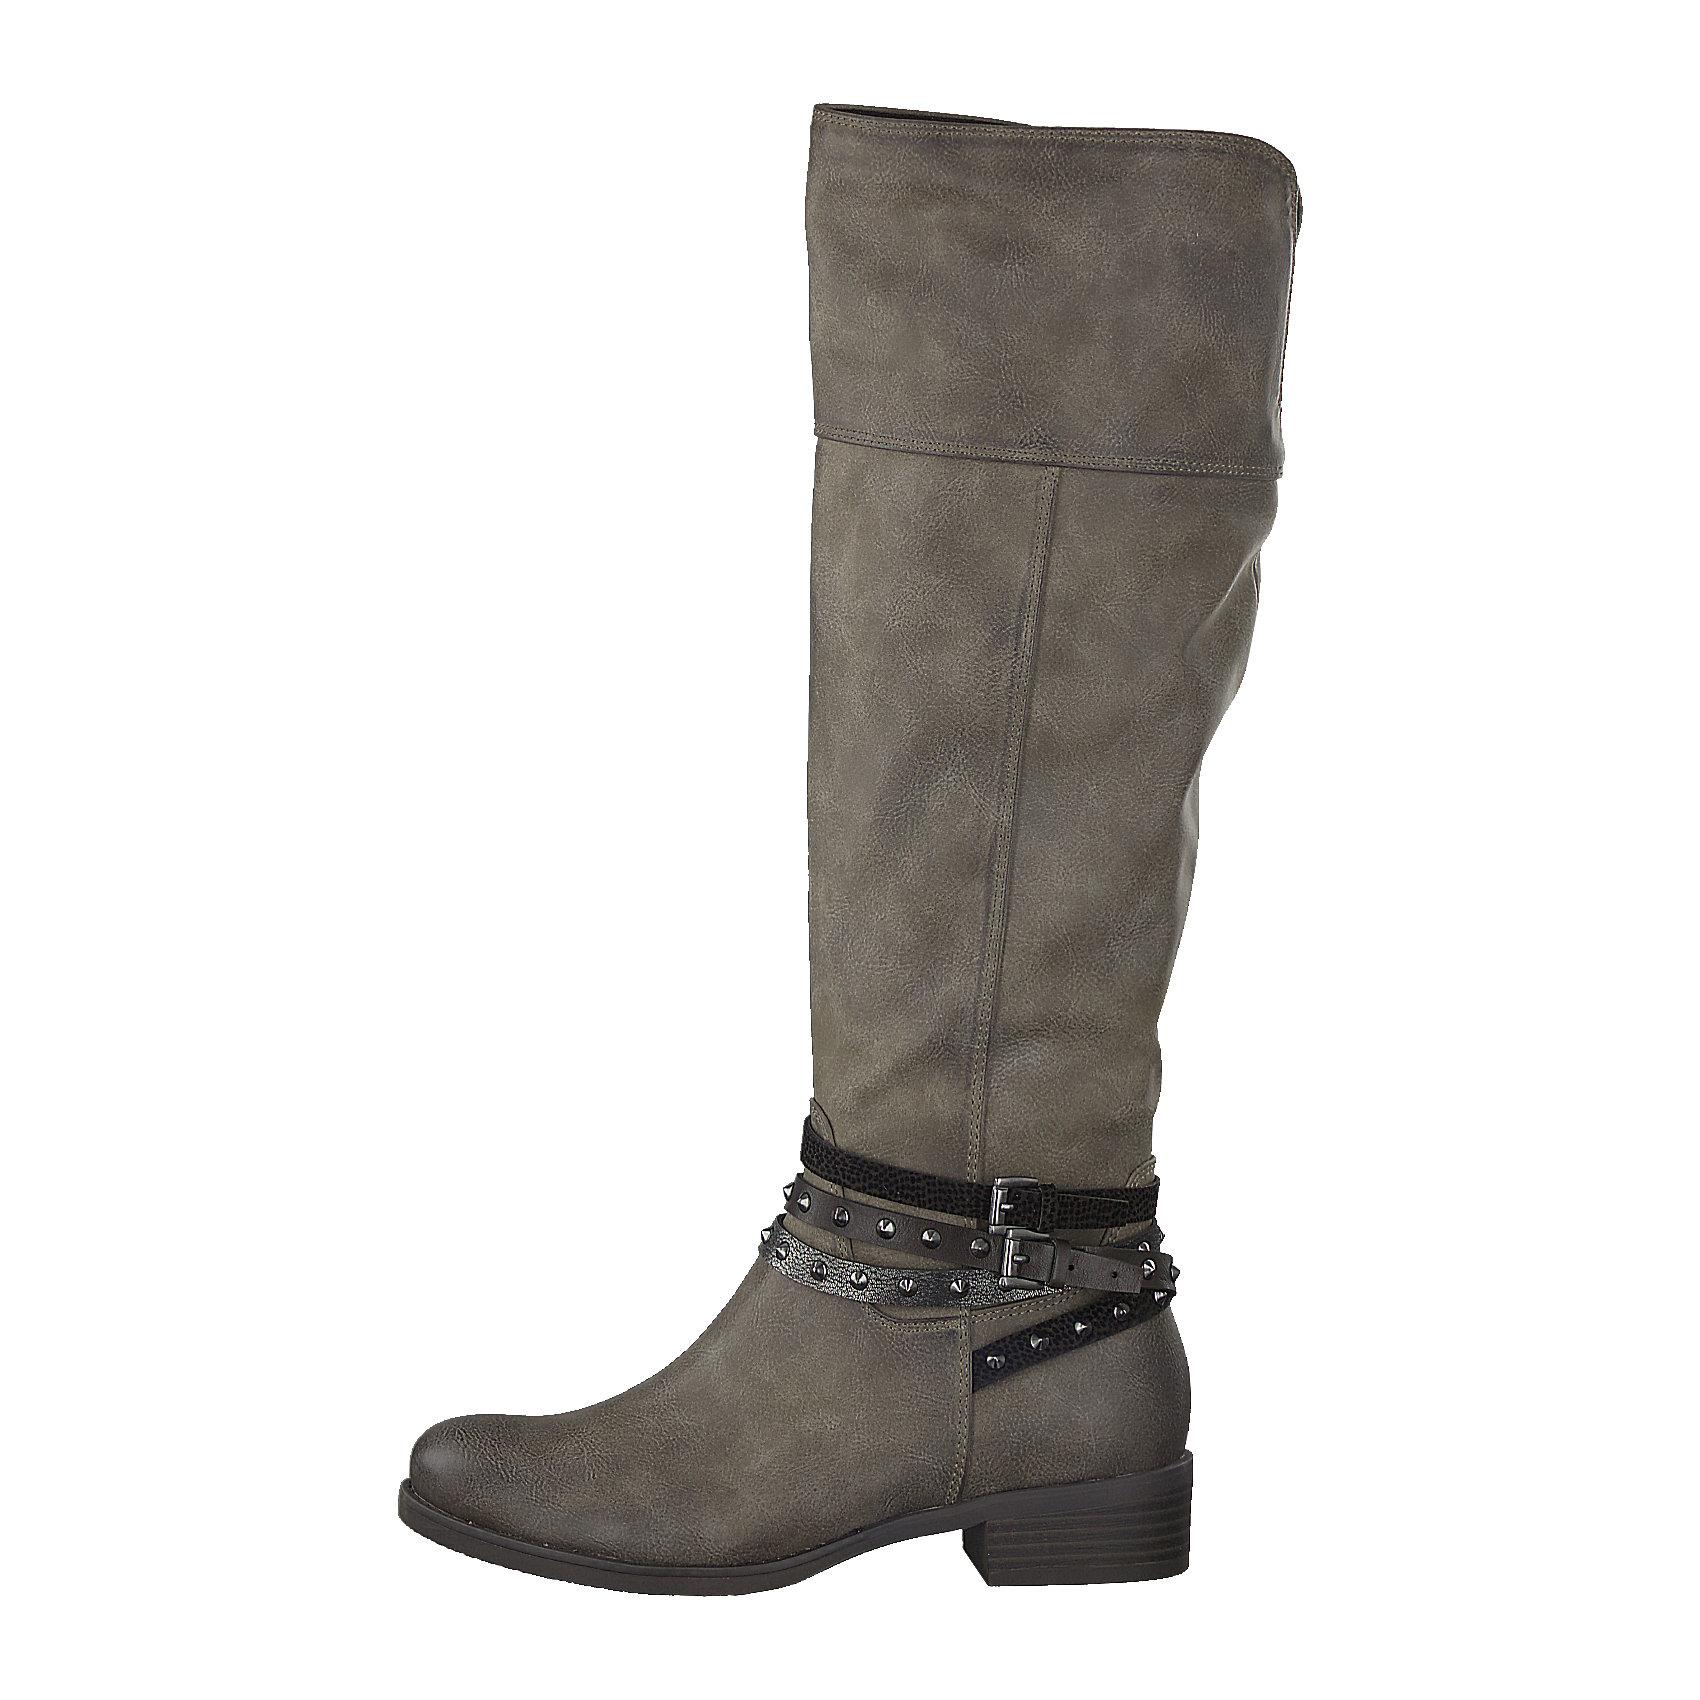 huge selection of 1d7ea 69143 Details zu Neu MARCO TOZZI Stiefel 6993090 für Damen dunkelgrau grau